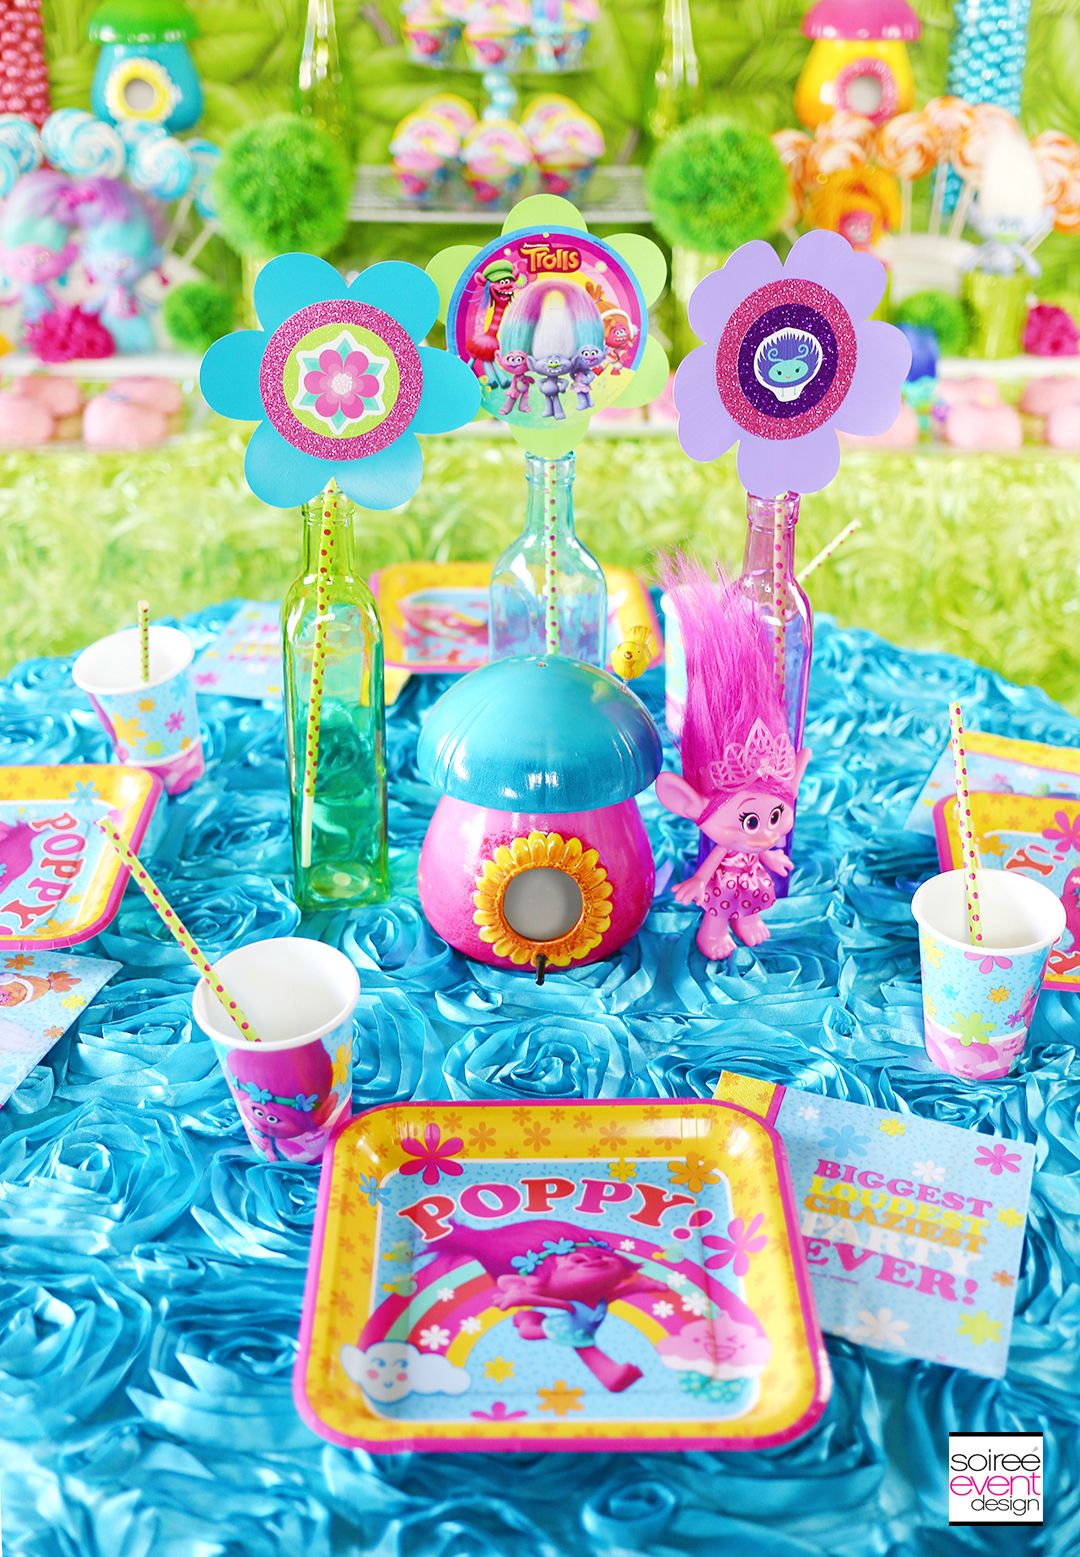 Fullsize Of Trolls Birthday Party Ideas